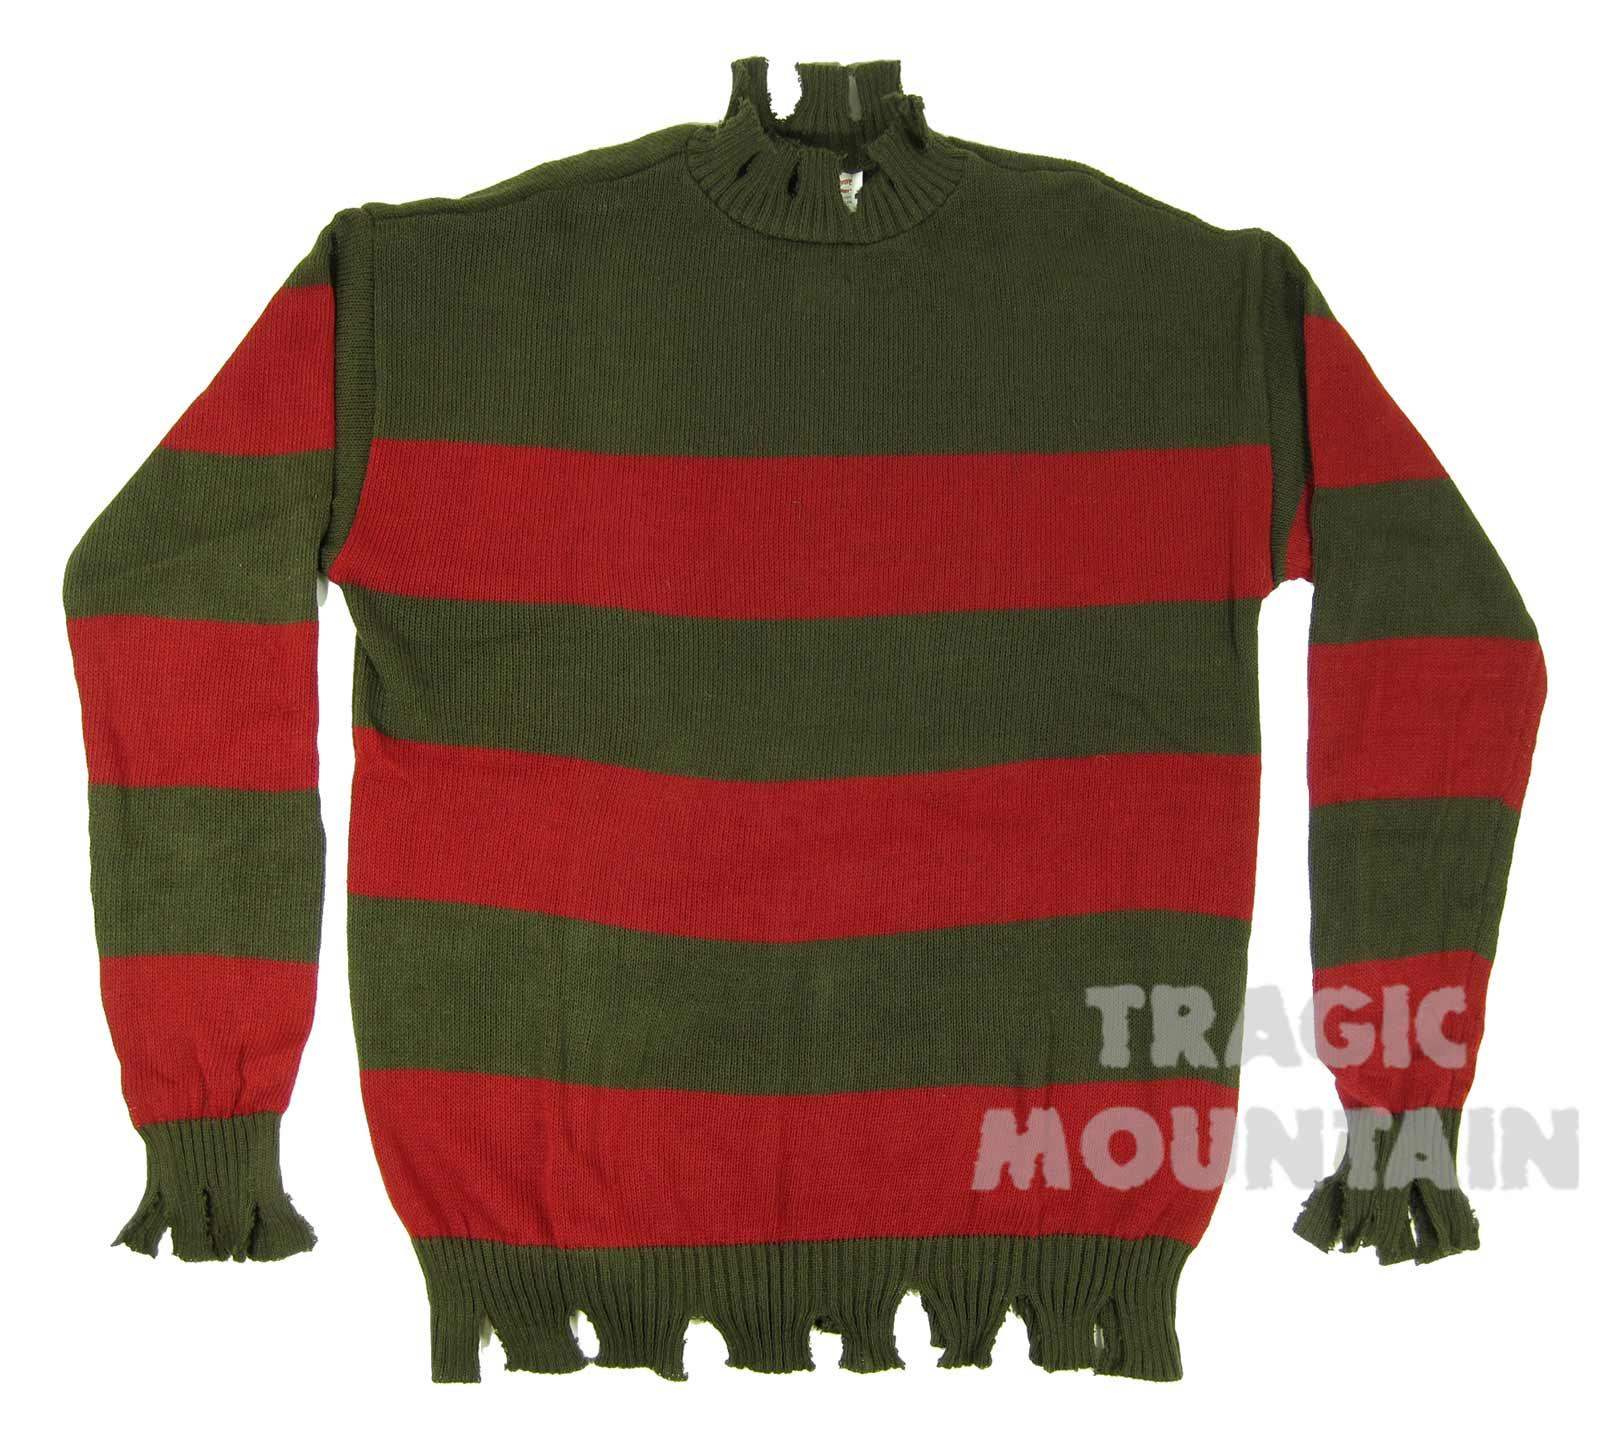 Freddy Krueger Deluxe Sweater Costume Adult Medium Large Xl Ebay